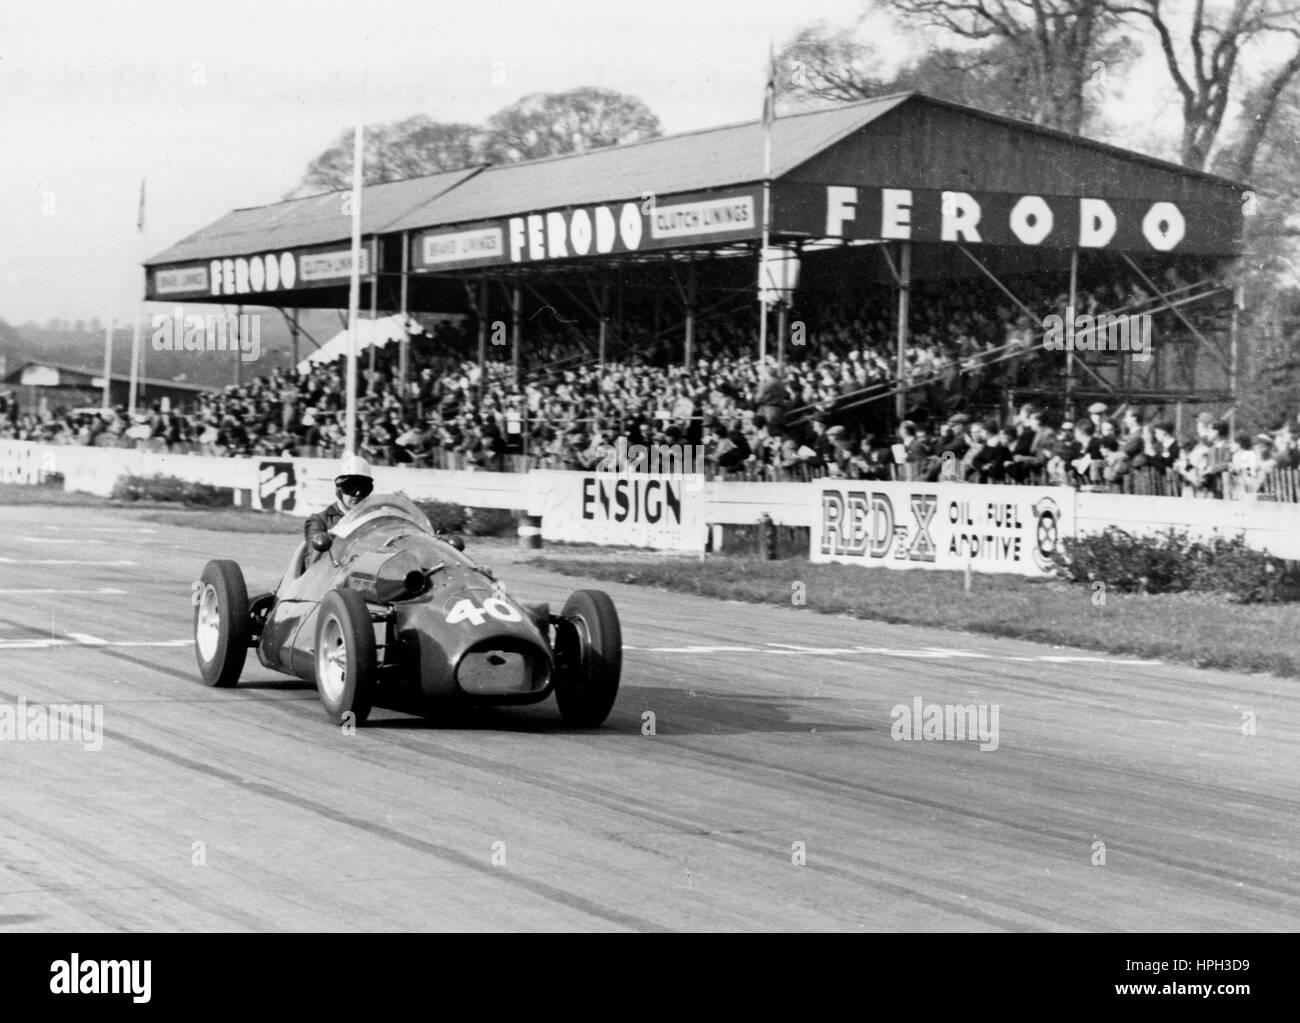 1954 Connaught, Ken McAlpine at Goodwood - Stock Image